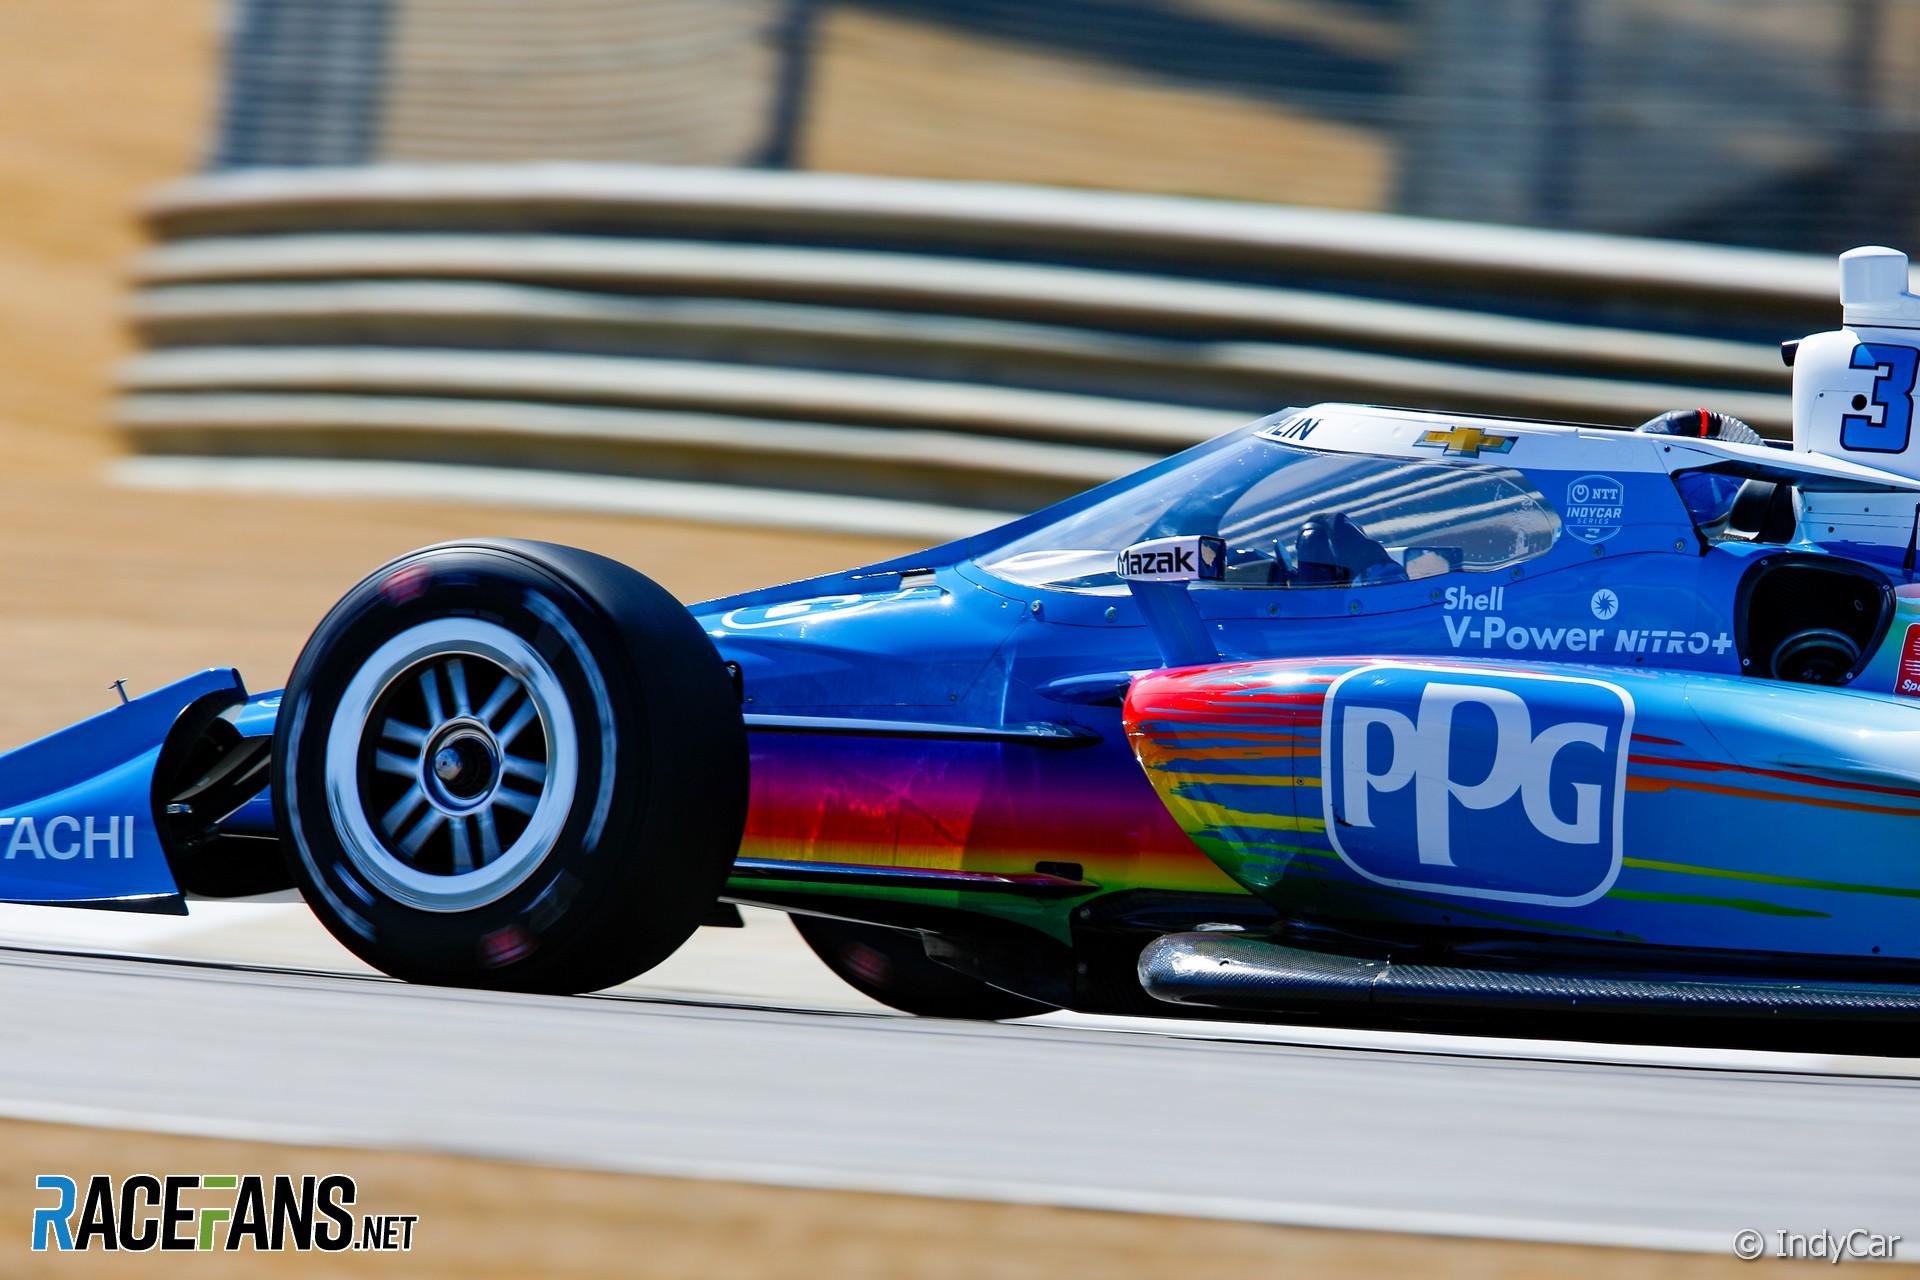 Scott McLaughlin, Penske, Barber Motorsport Park, 2021